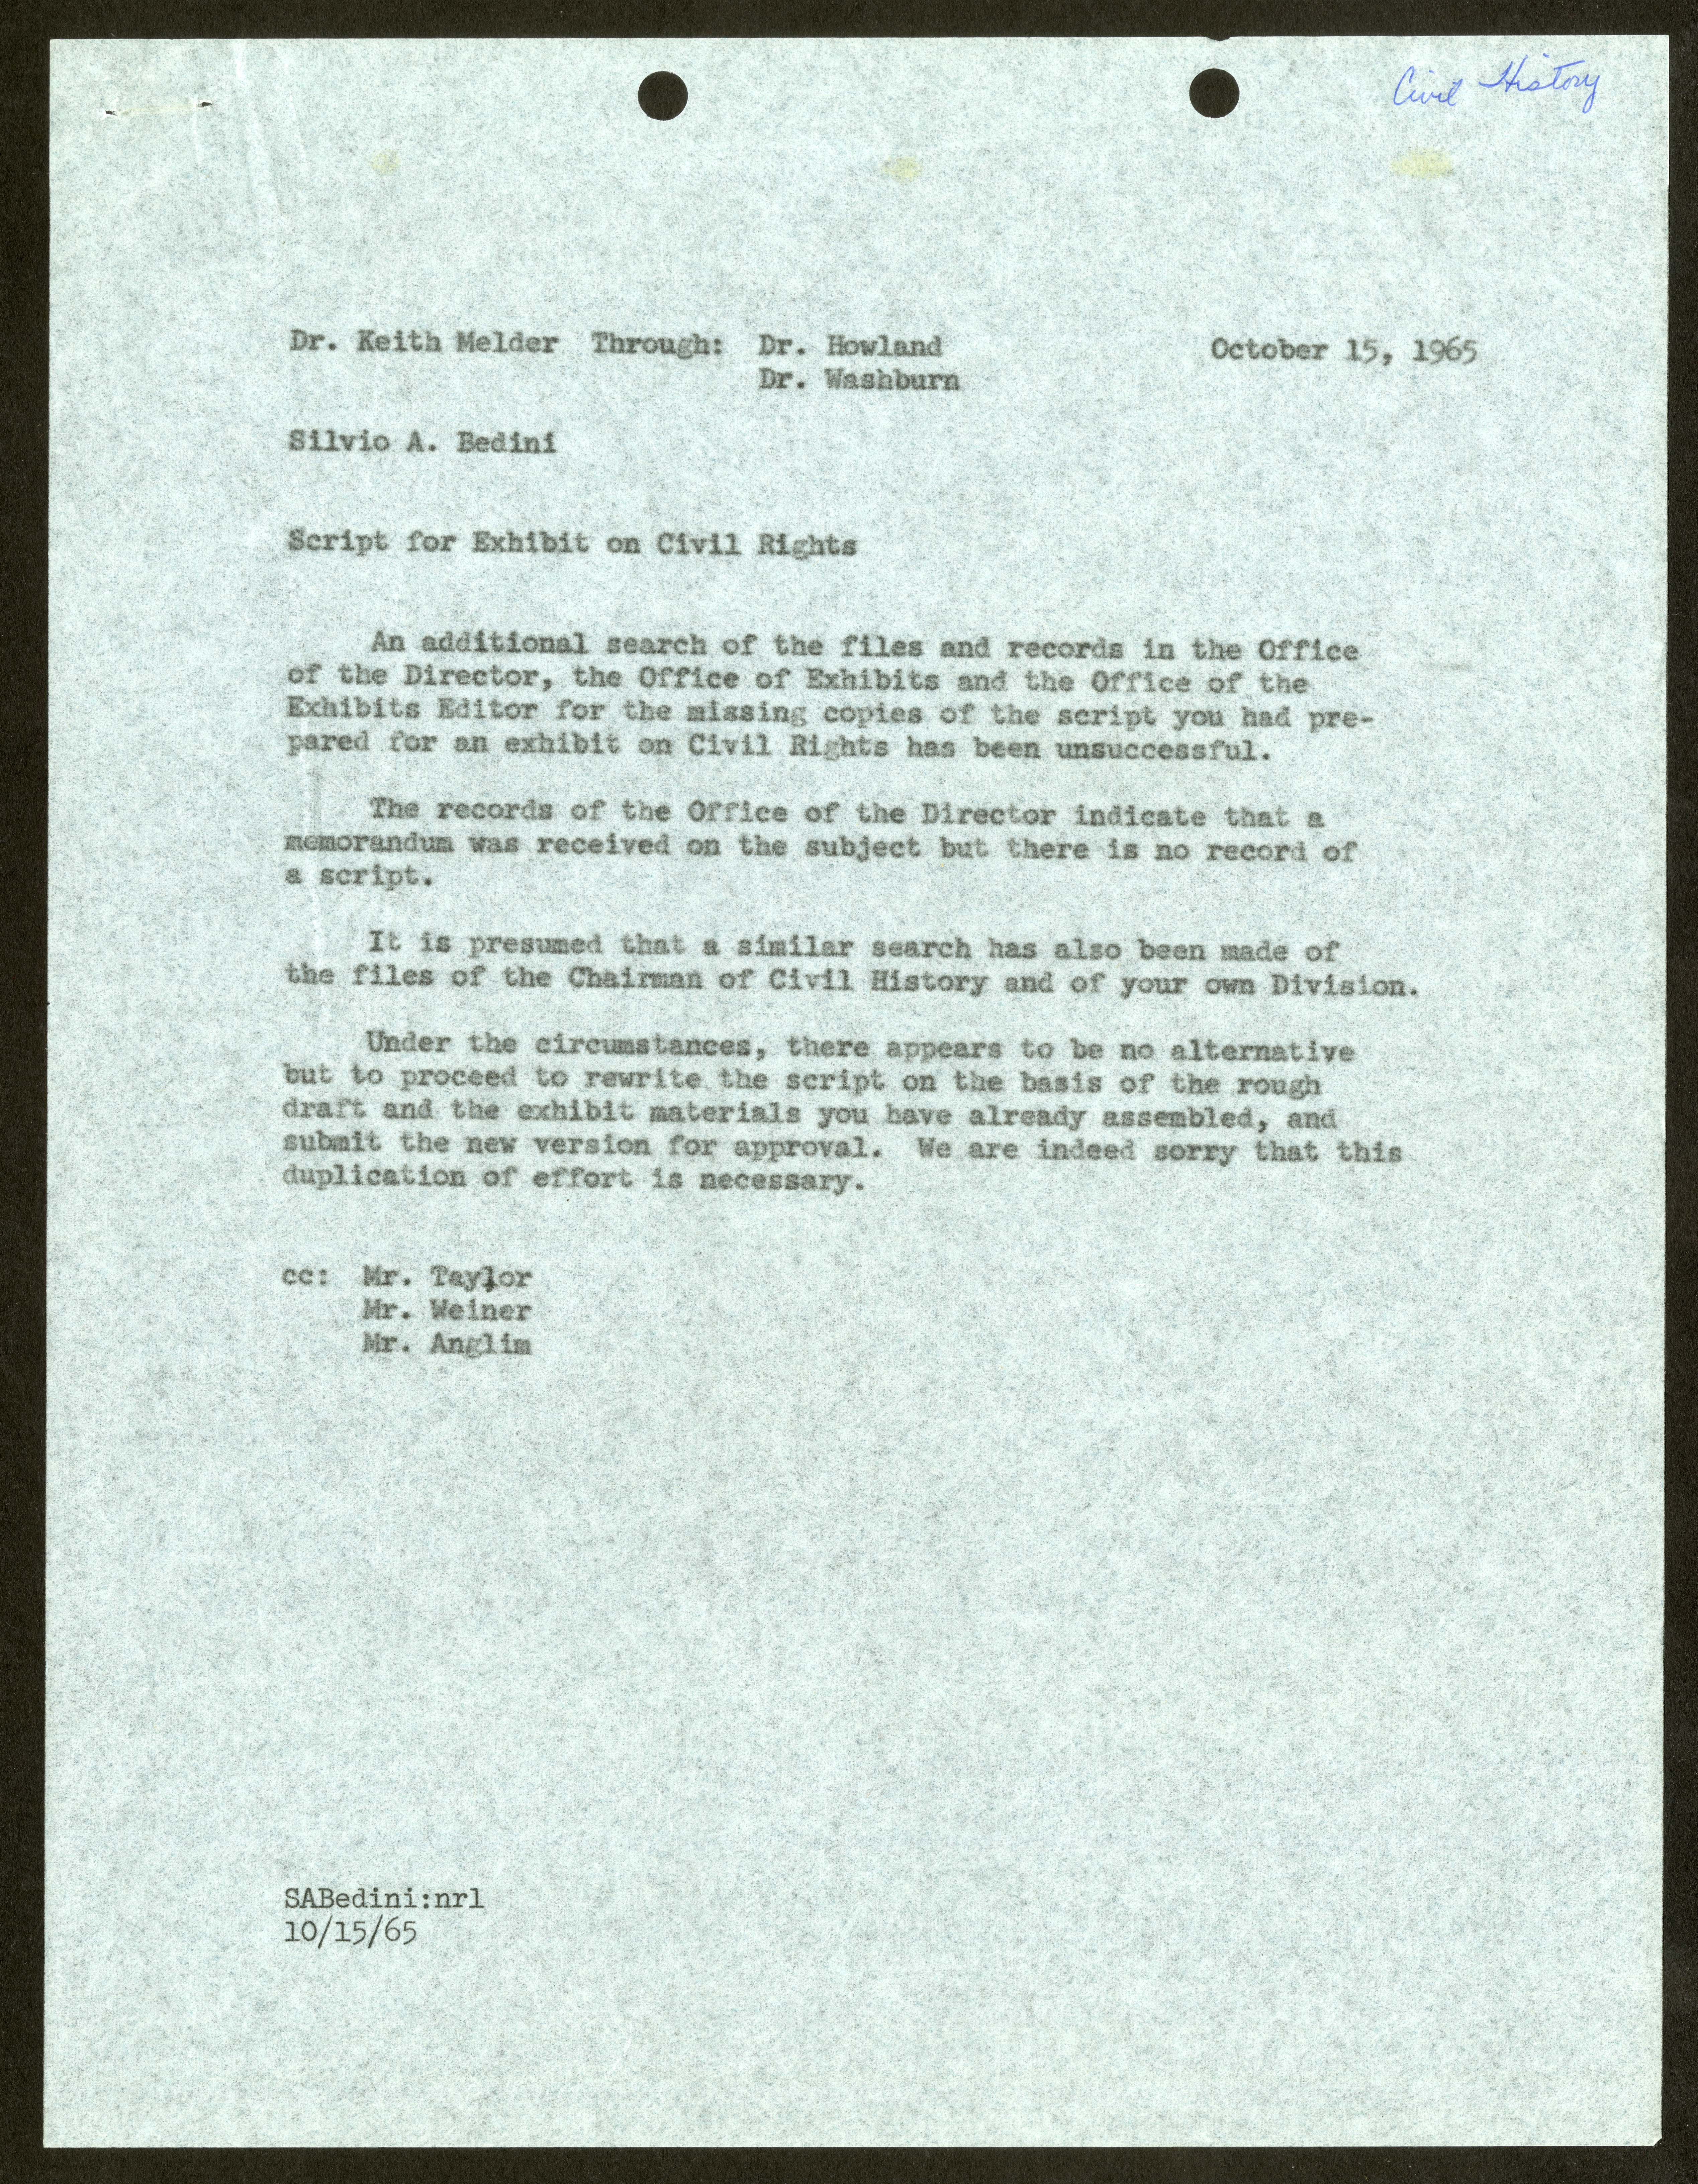 Typed memorandum on blue paper.